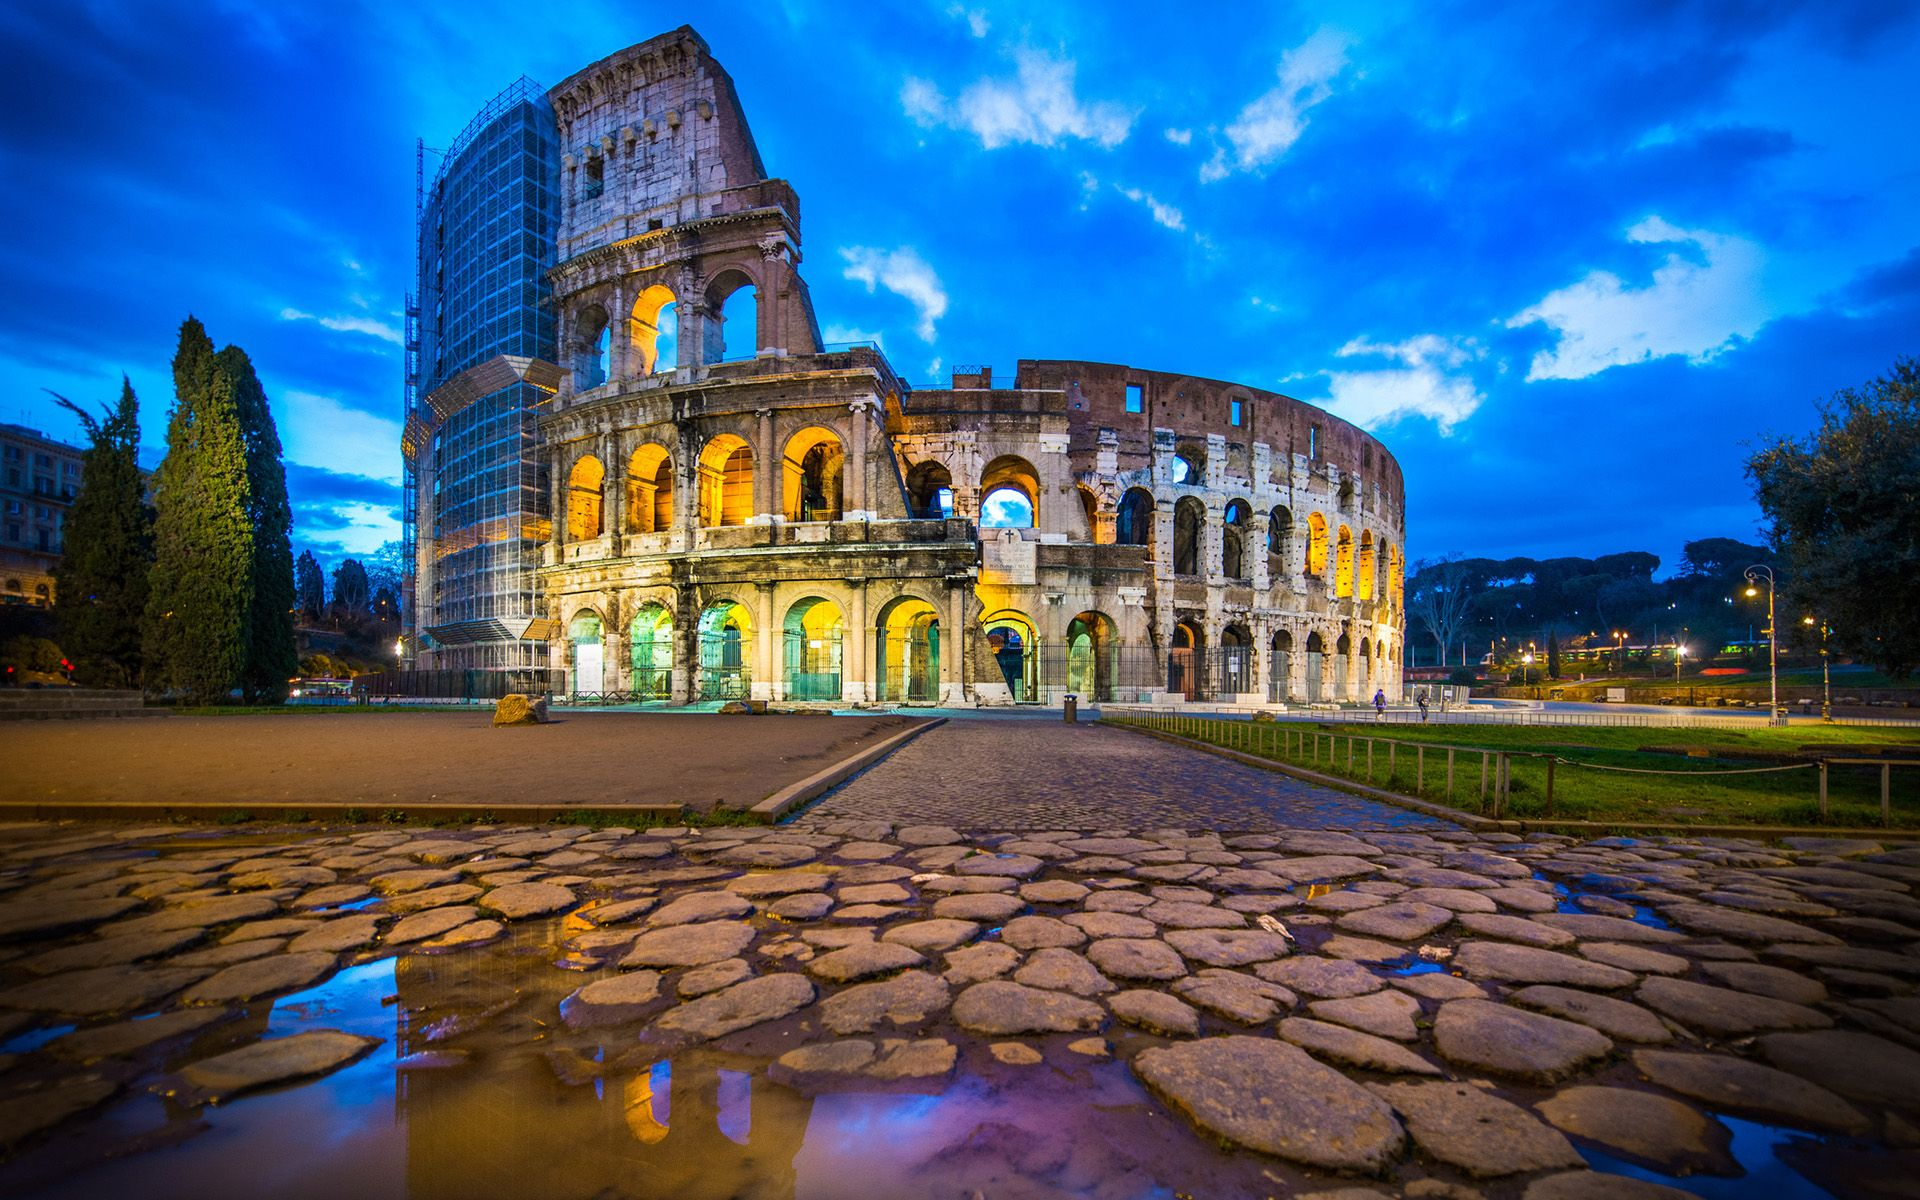 Download Wallpaper Night Colosseum - b2f56817b7d3efdce36c5aee61912074  Pic.jpg